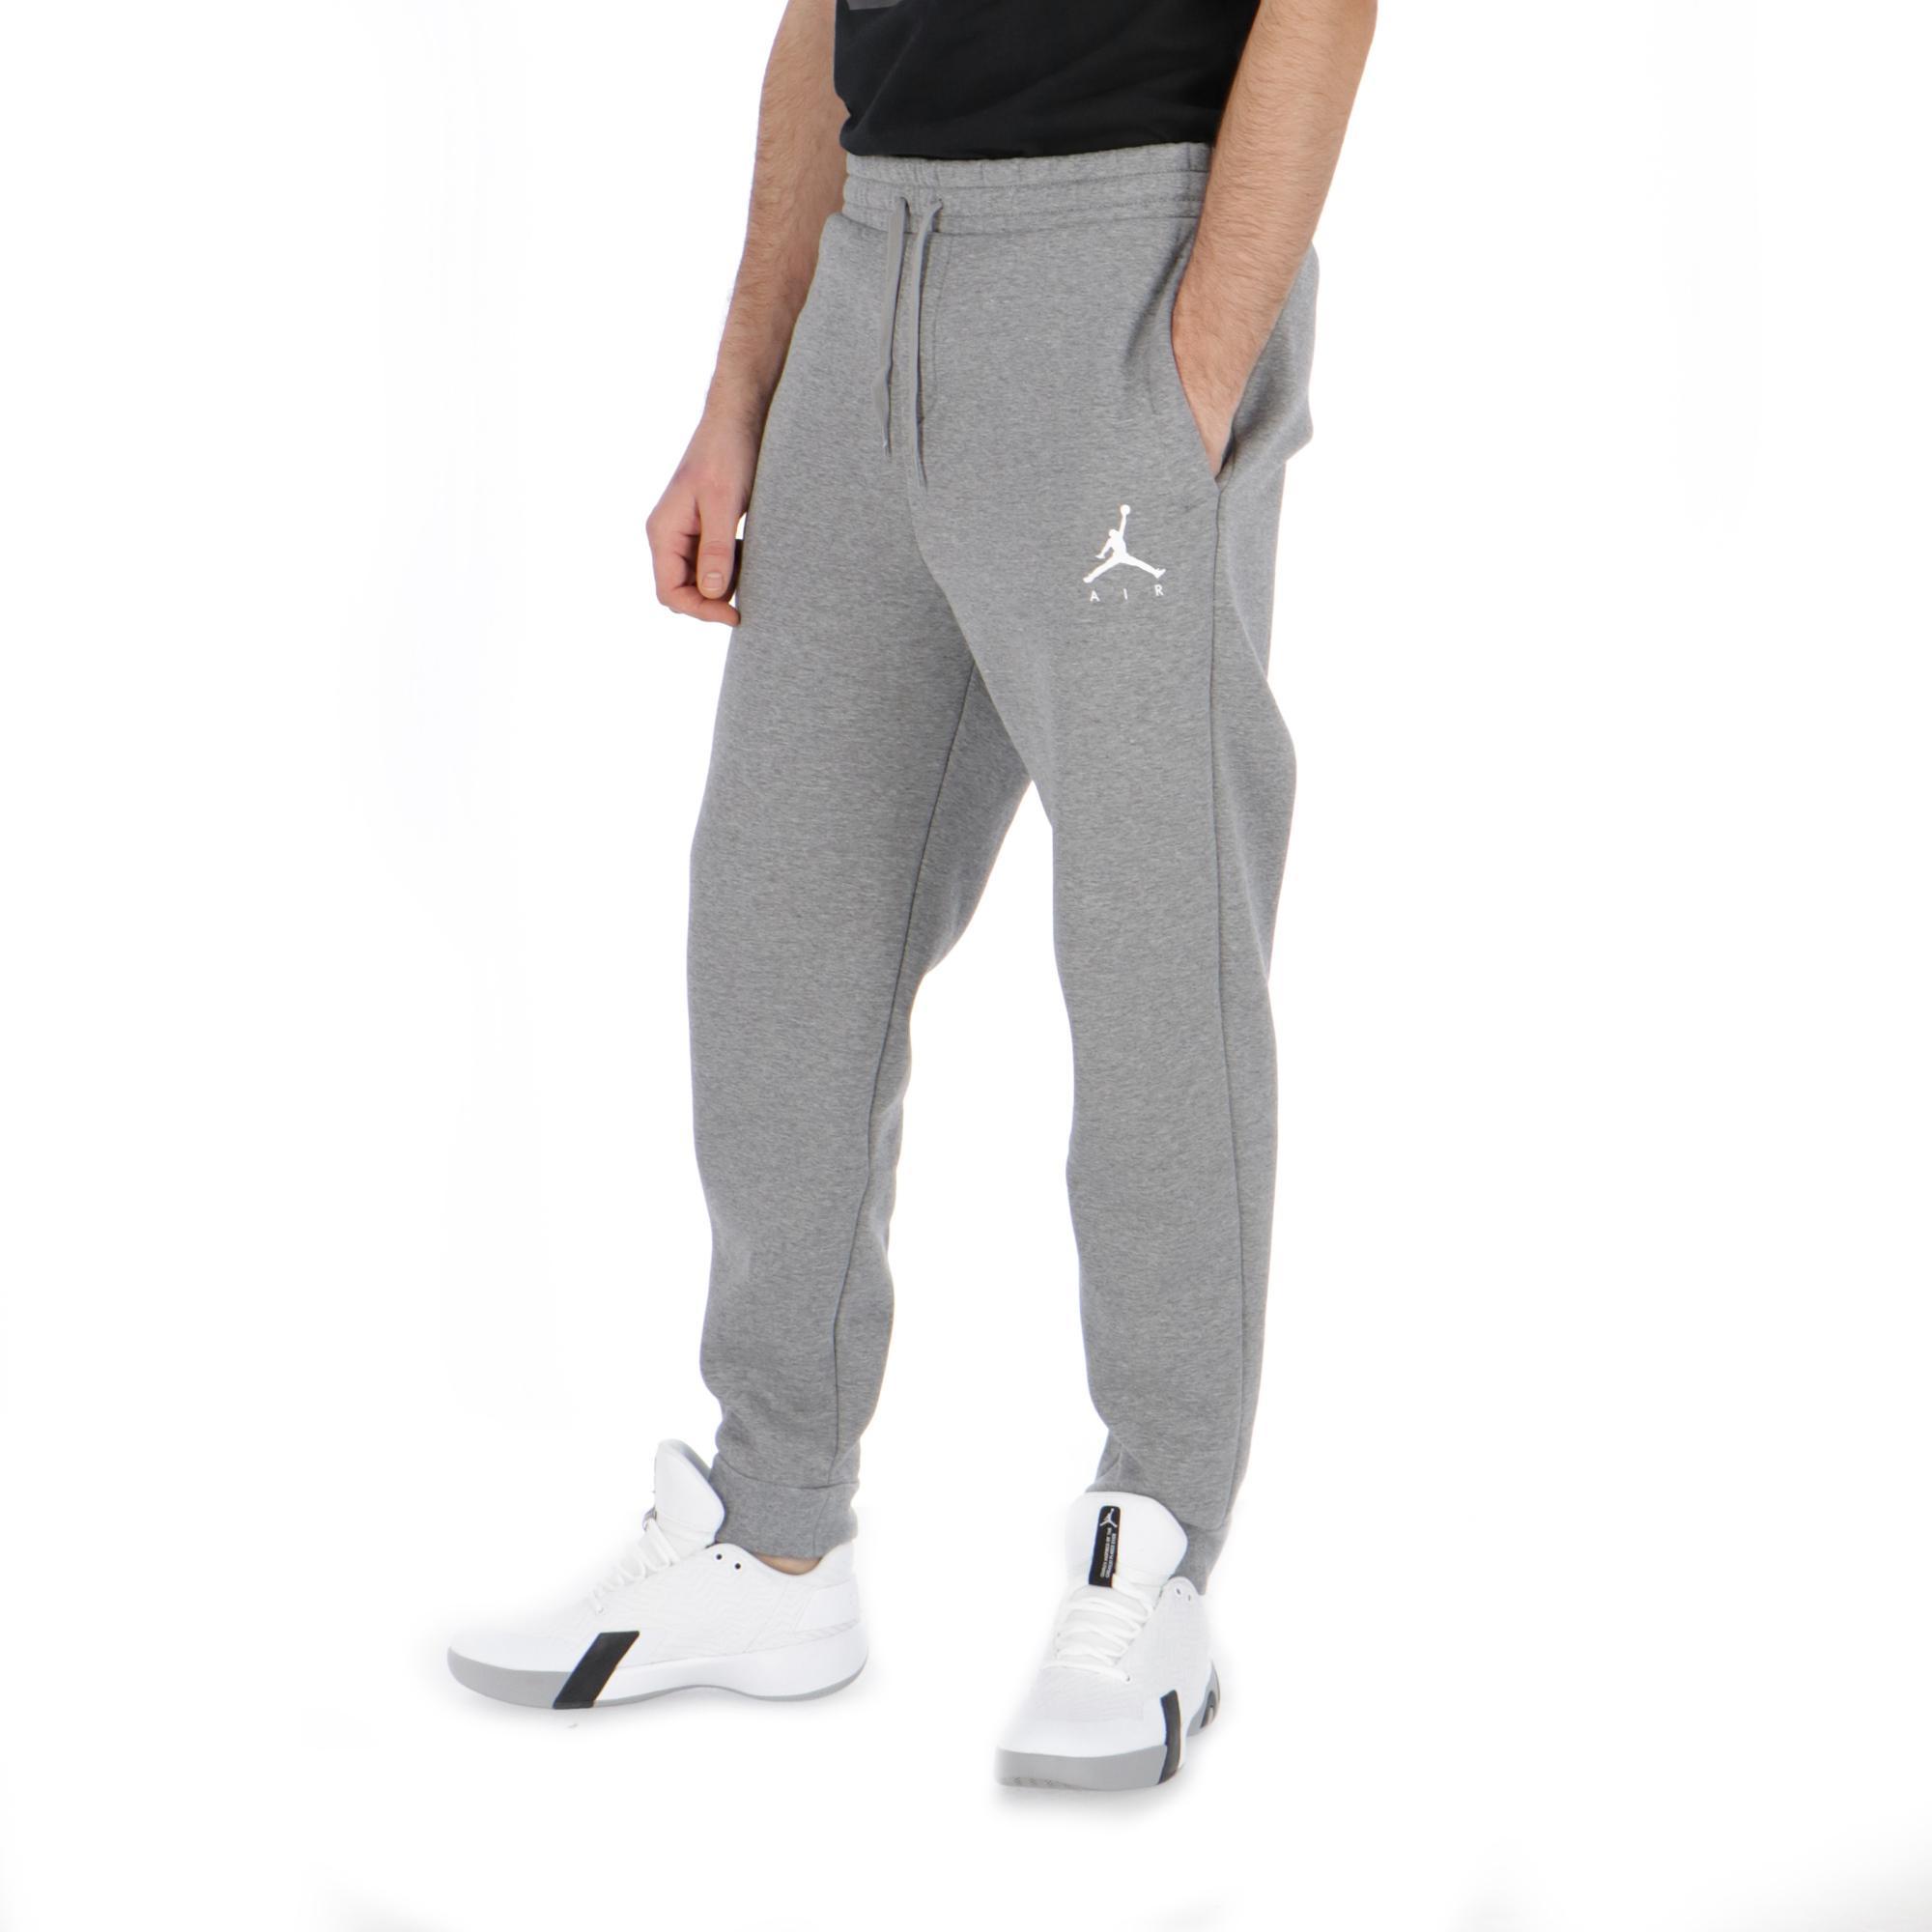 9b6fc99b Jordan Jumpman Fleece Pant Carbon Heather/white | Treesse